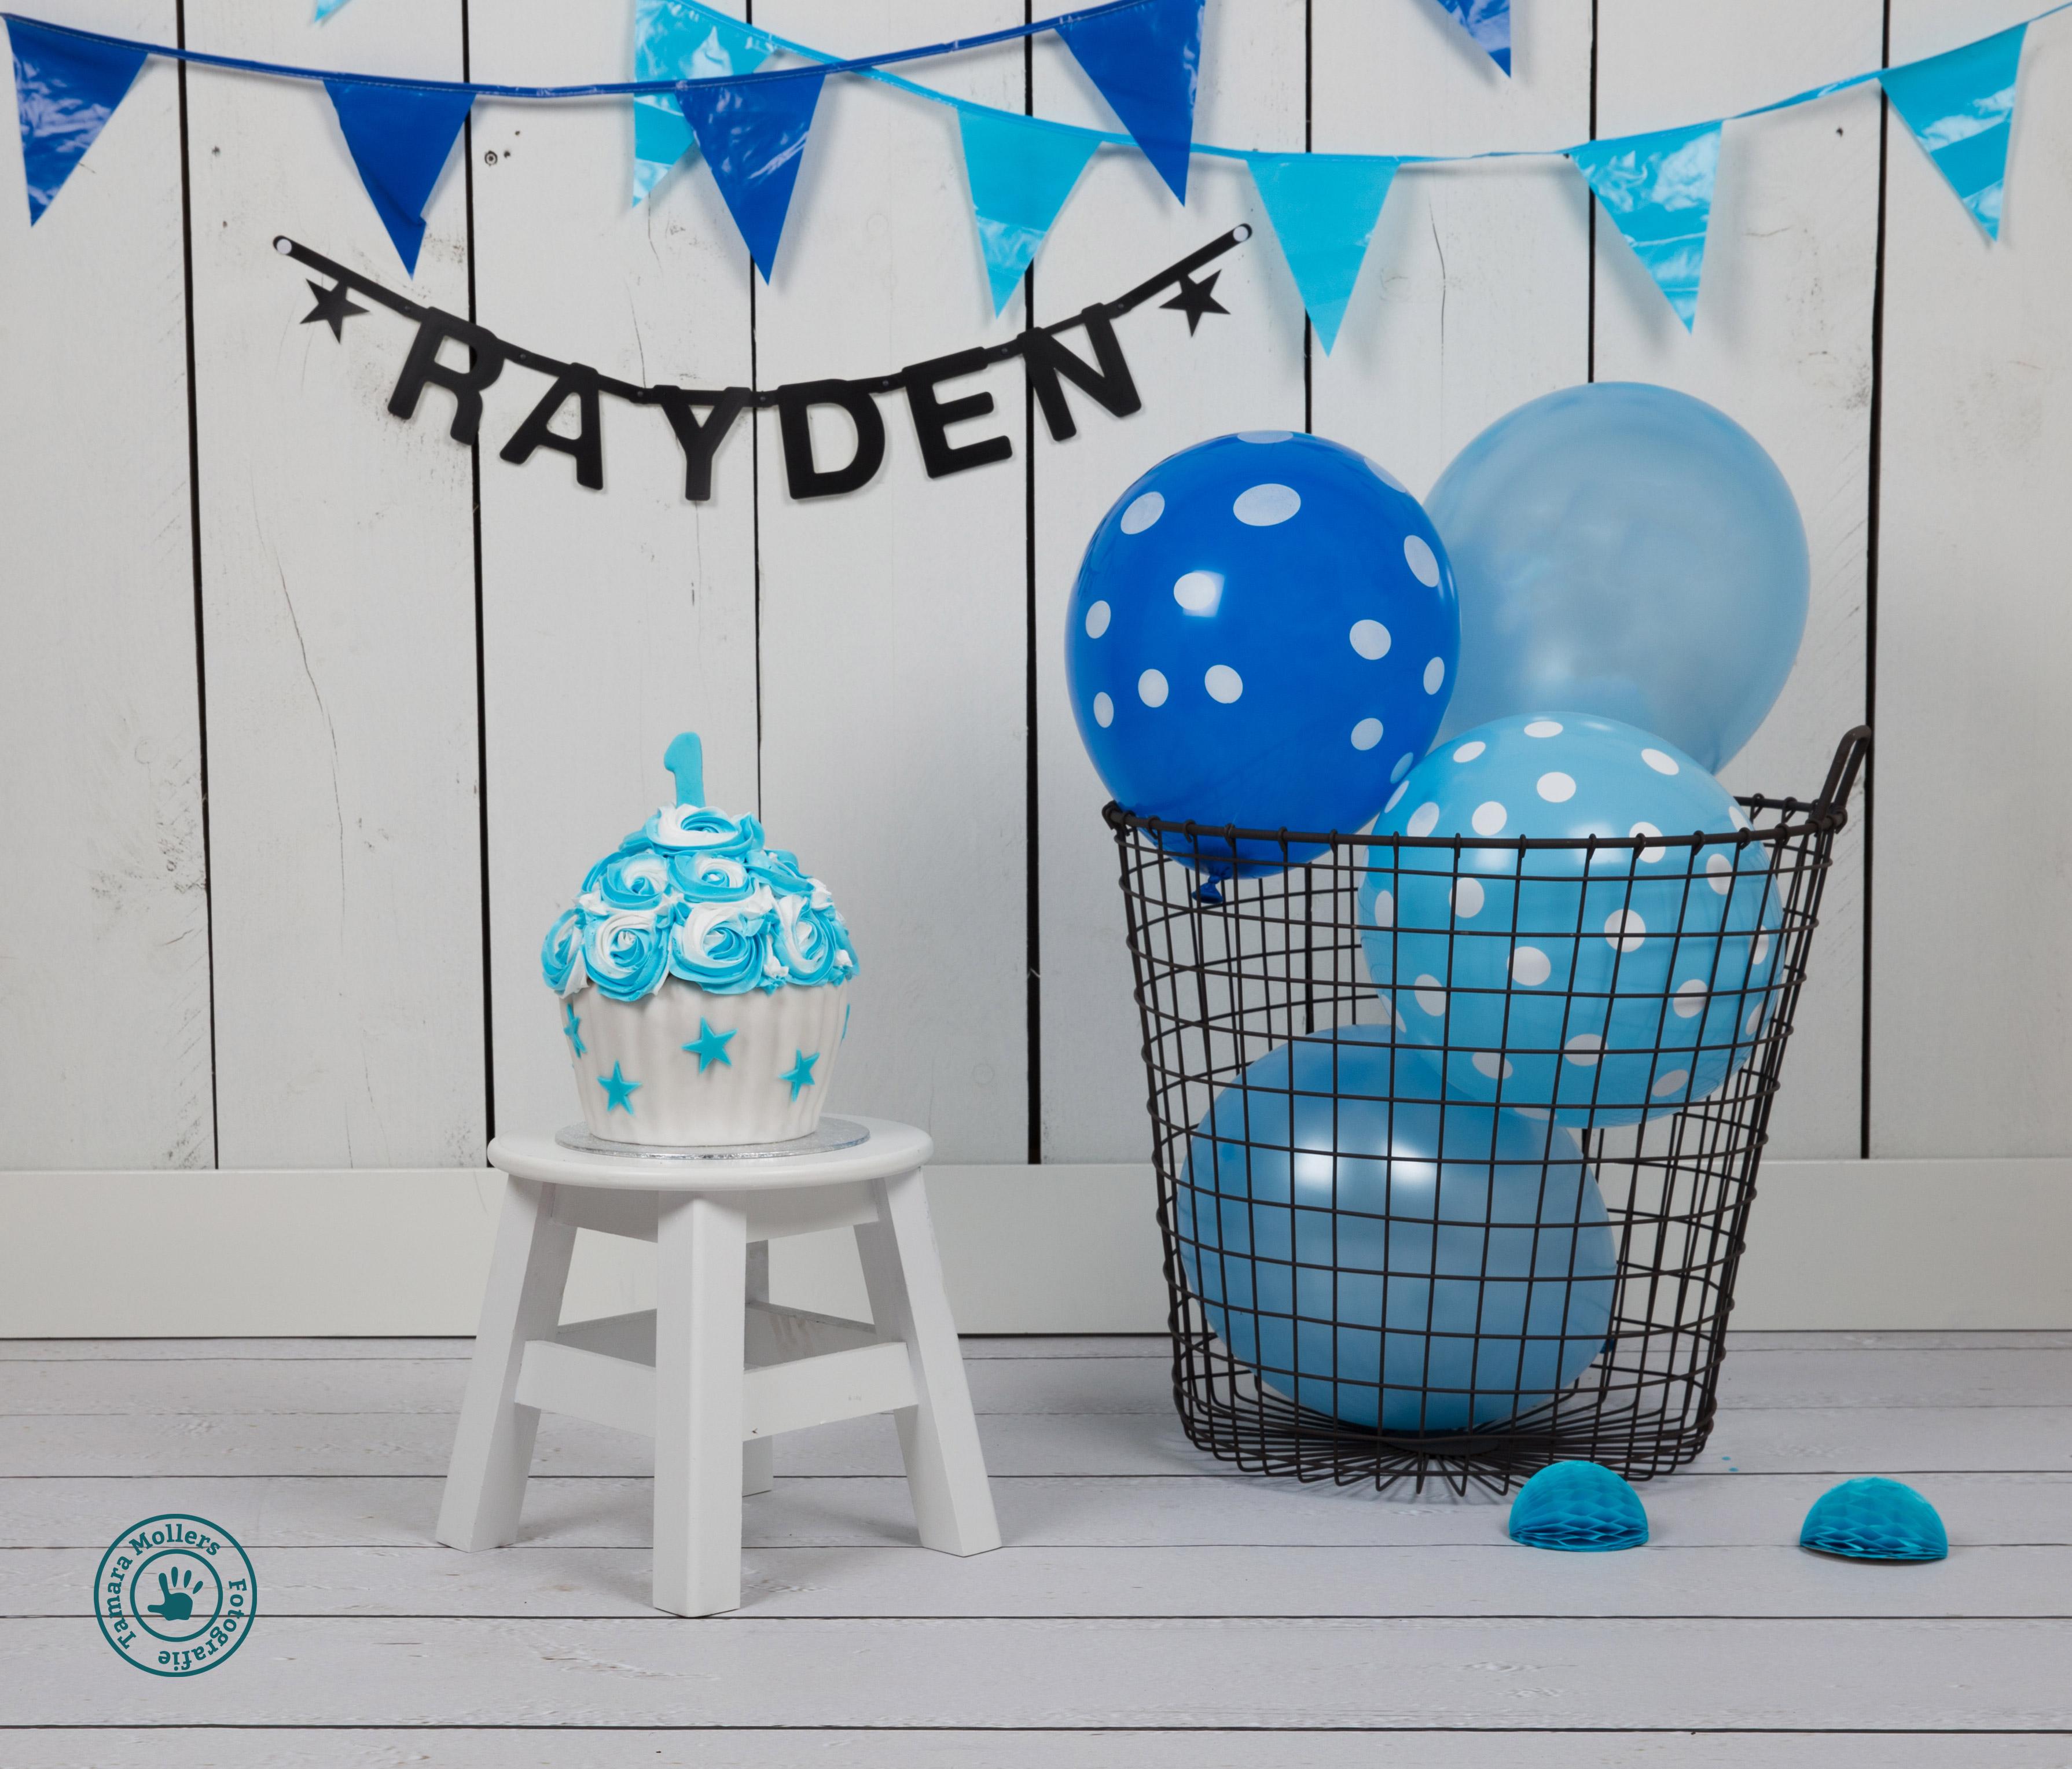 Verjaardagsfoto's & Cake Smash